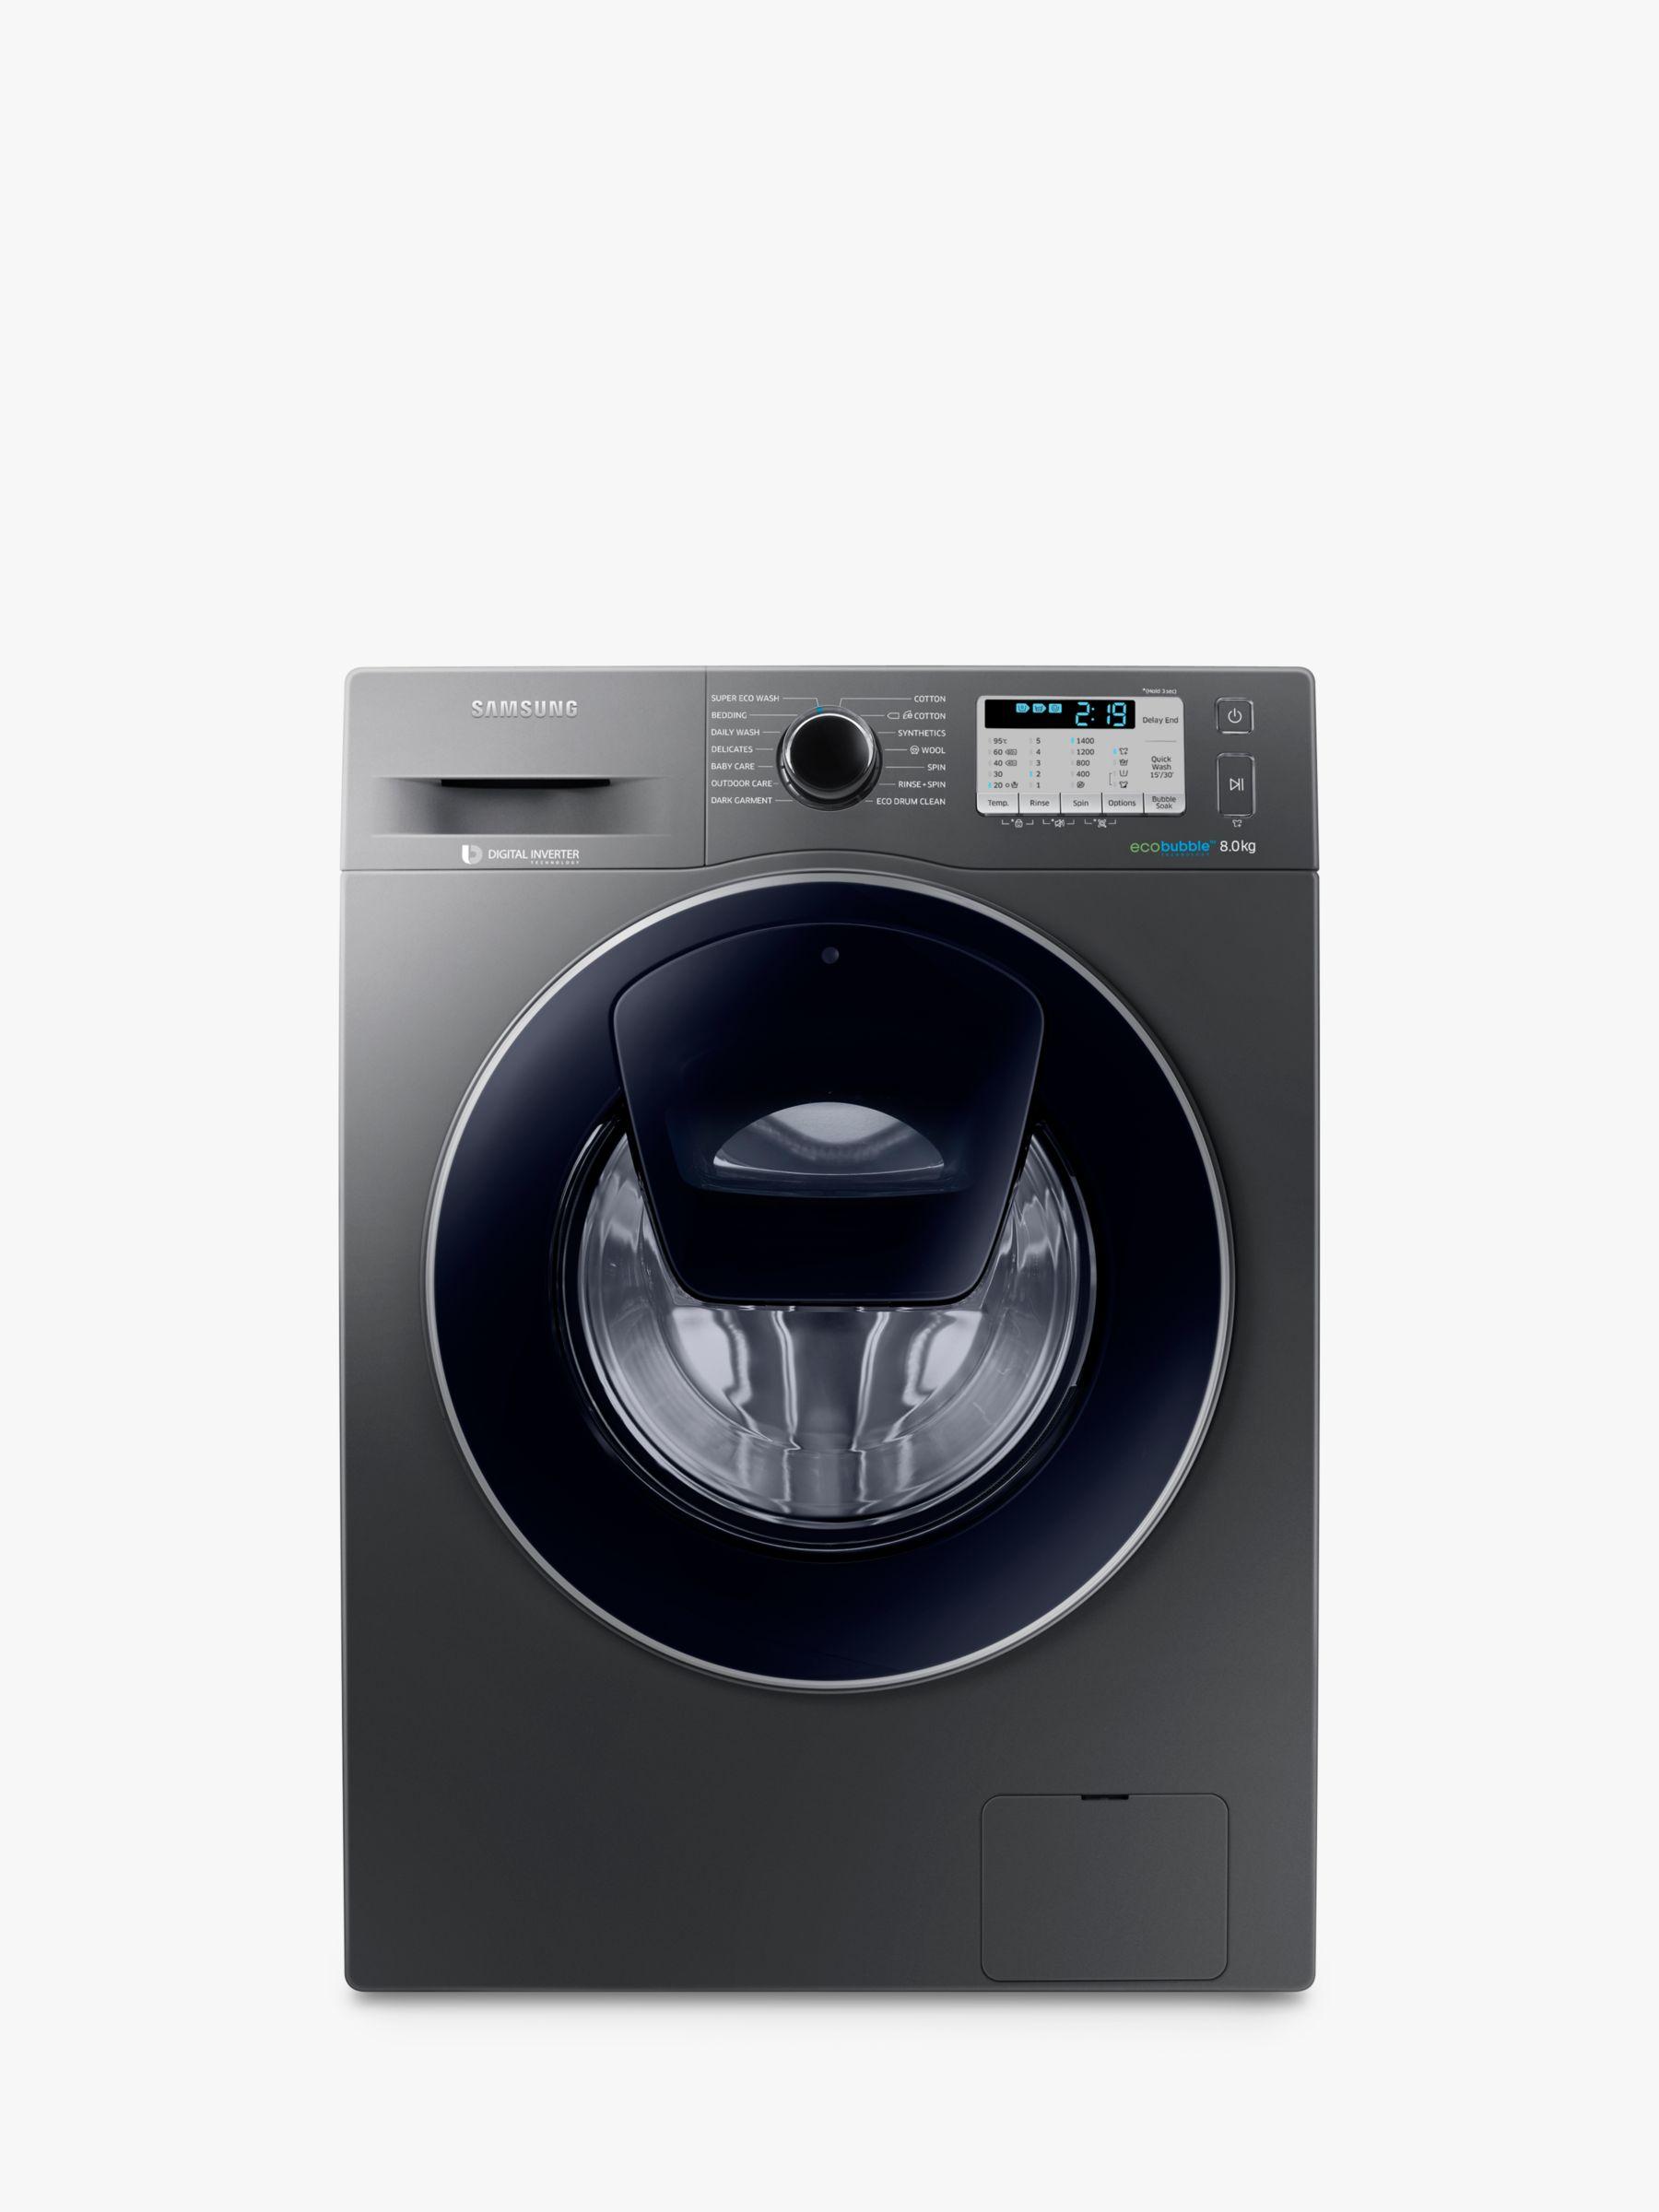 Samsung Samsung AddWash WW80K5413UX/EU Washing Machine, 8kg Load, A+++ Energy Rating, 1400rpm Spin, Inox